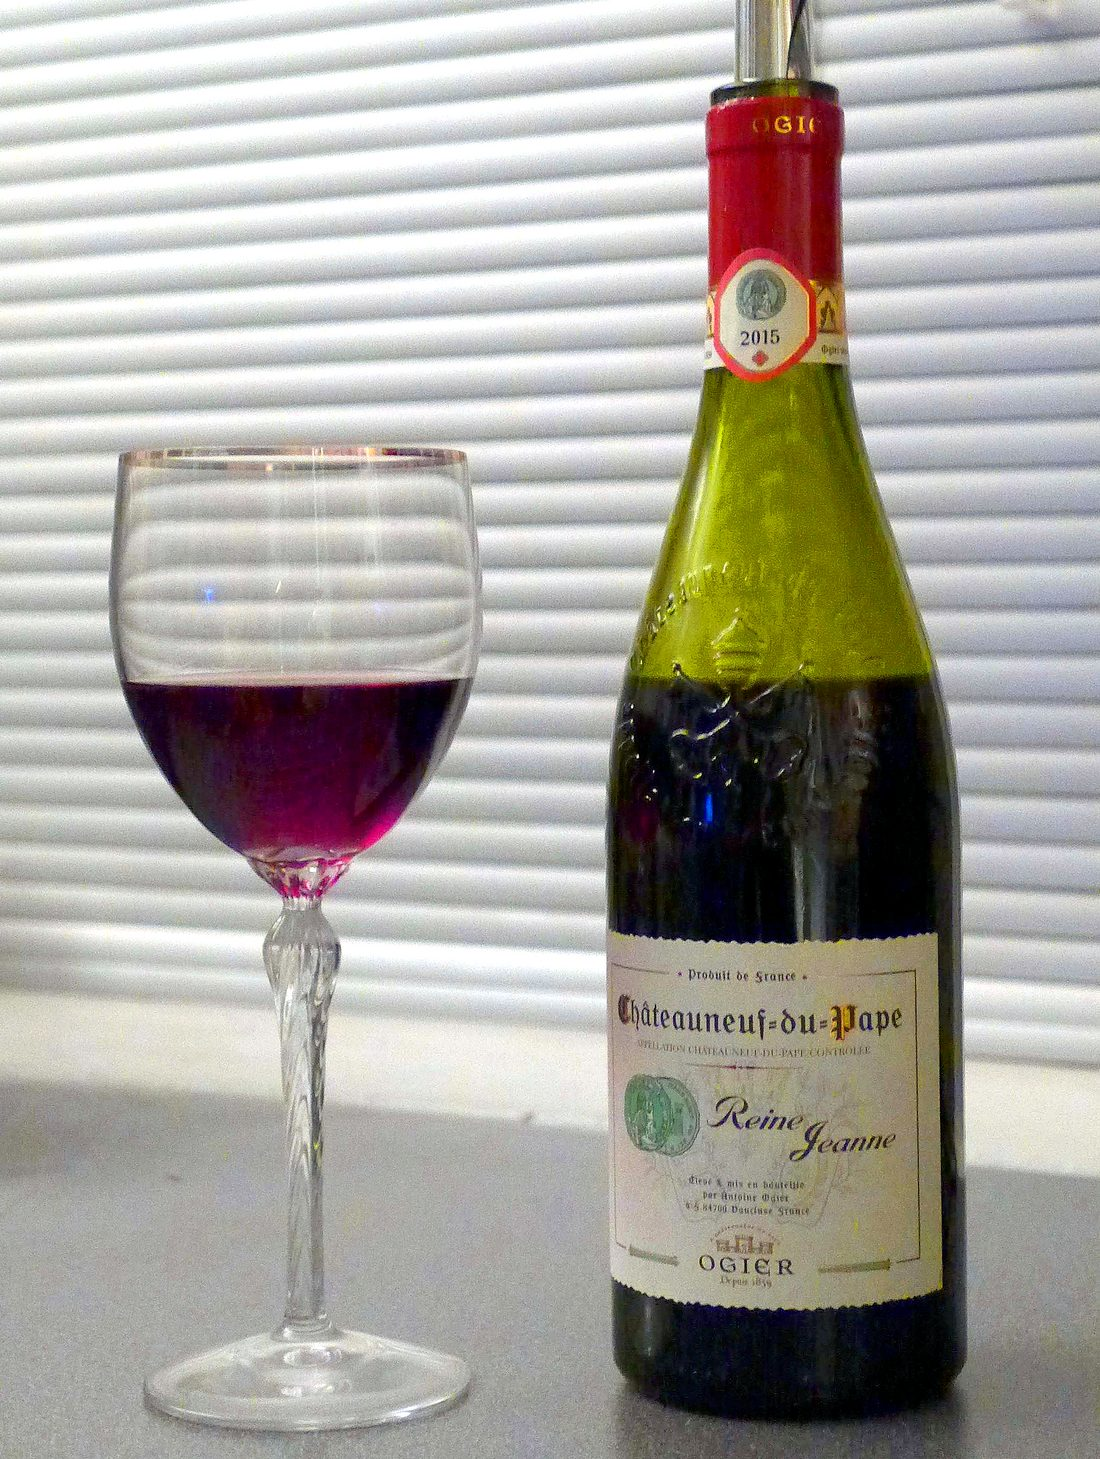 Ogier Chateauneuf-du-Pape Reine Jeanne 2015